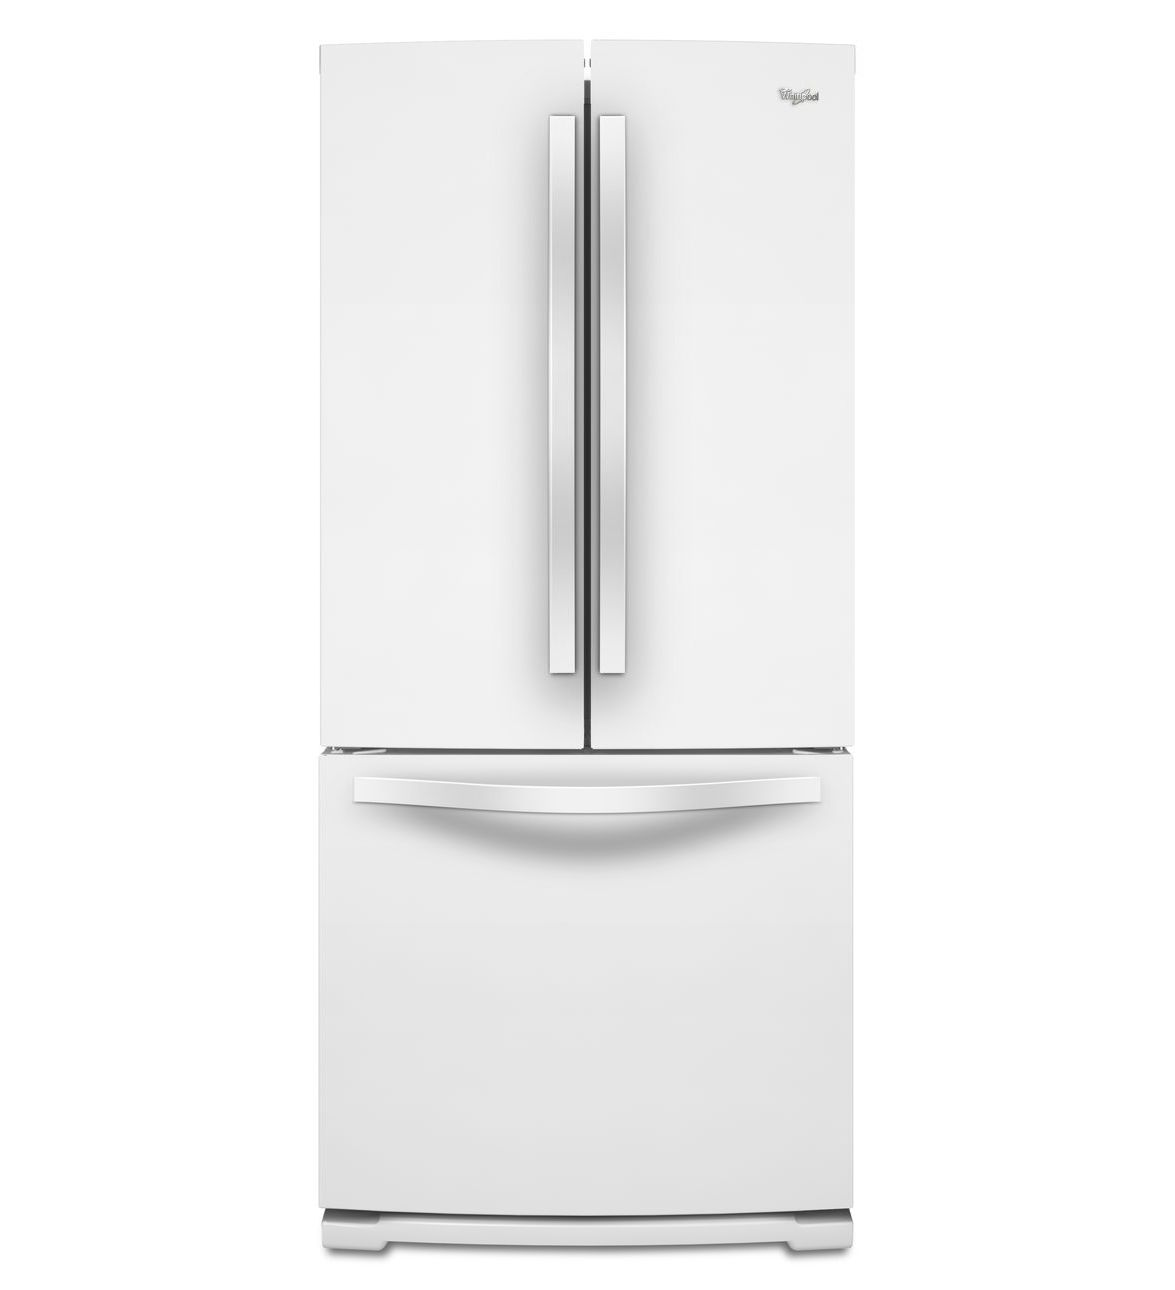 30 Inch Wide French Door Refrigerator 19 7 Cu Ft